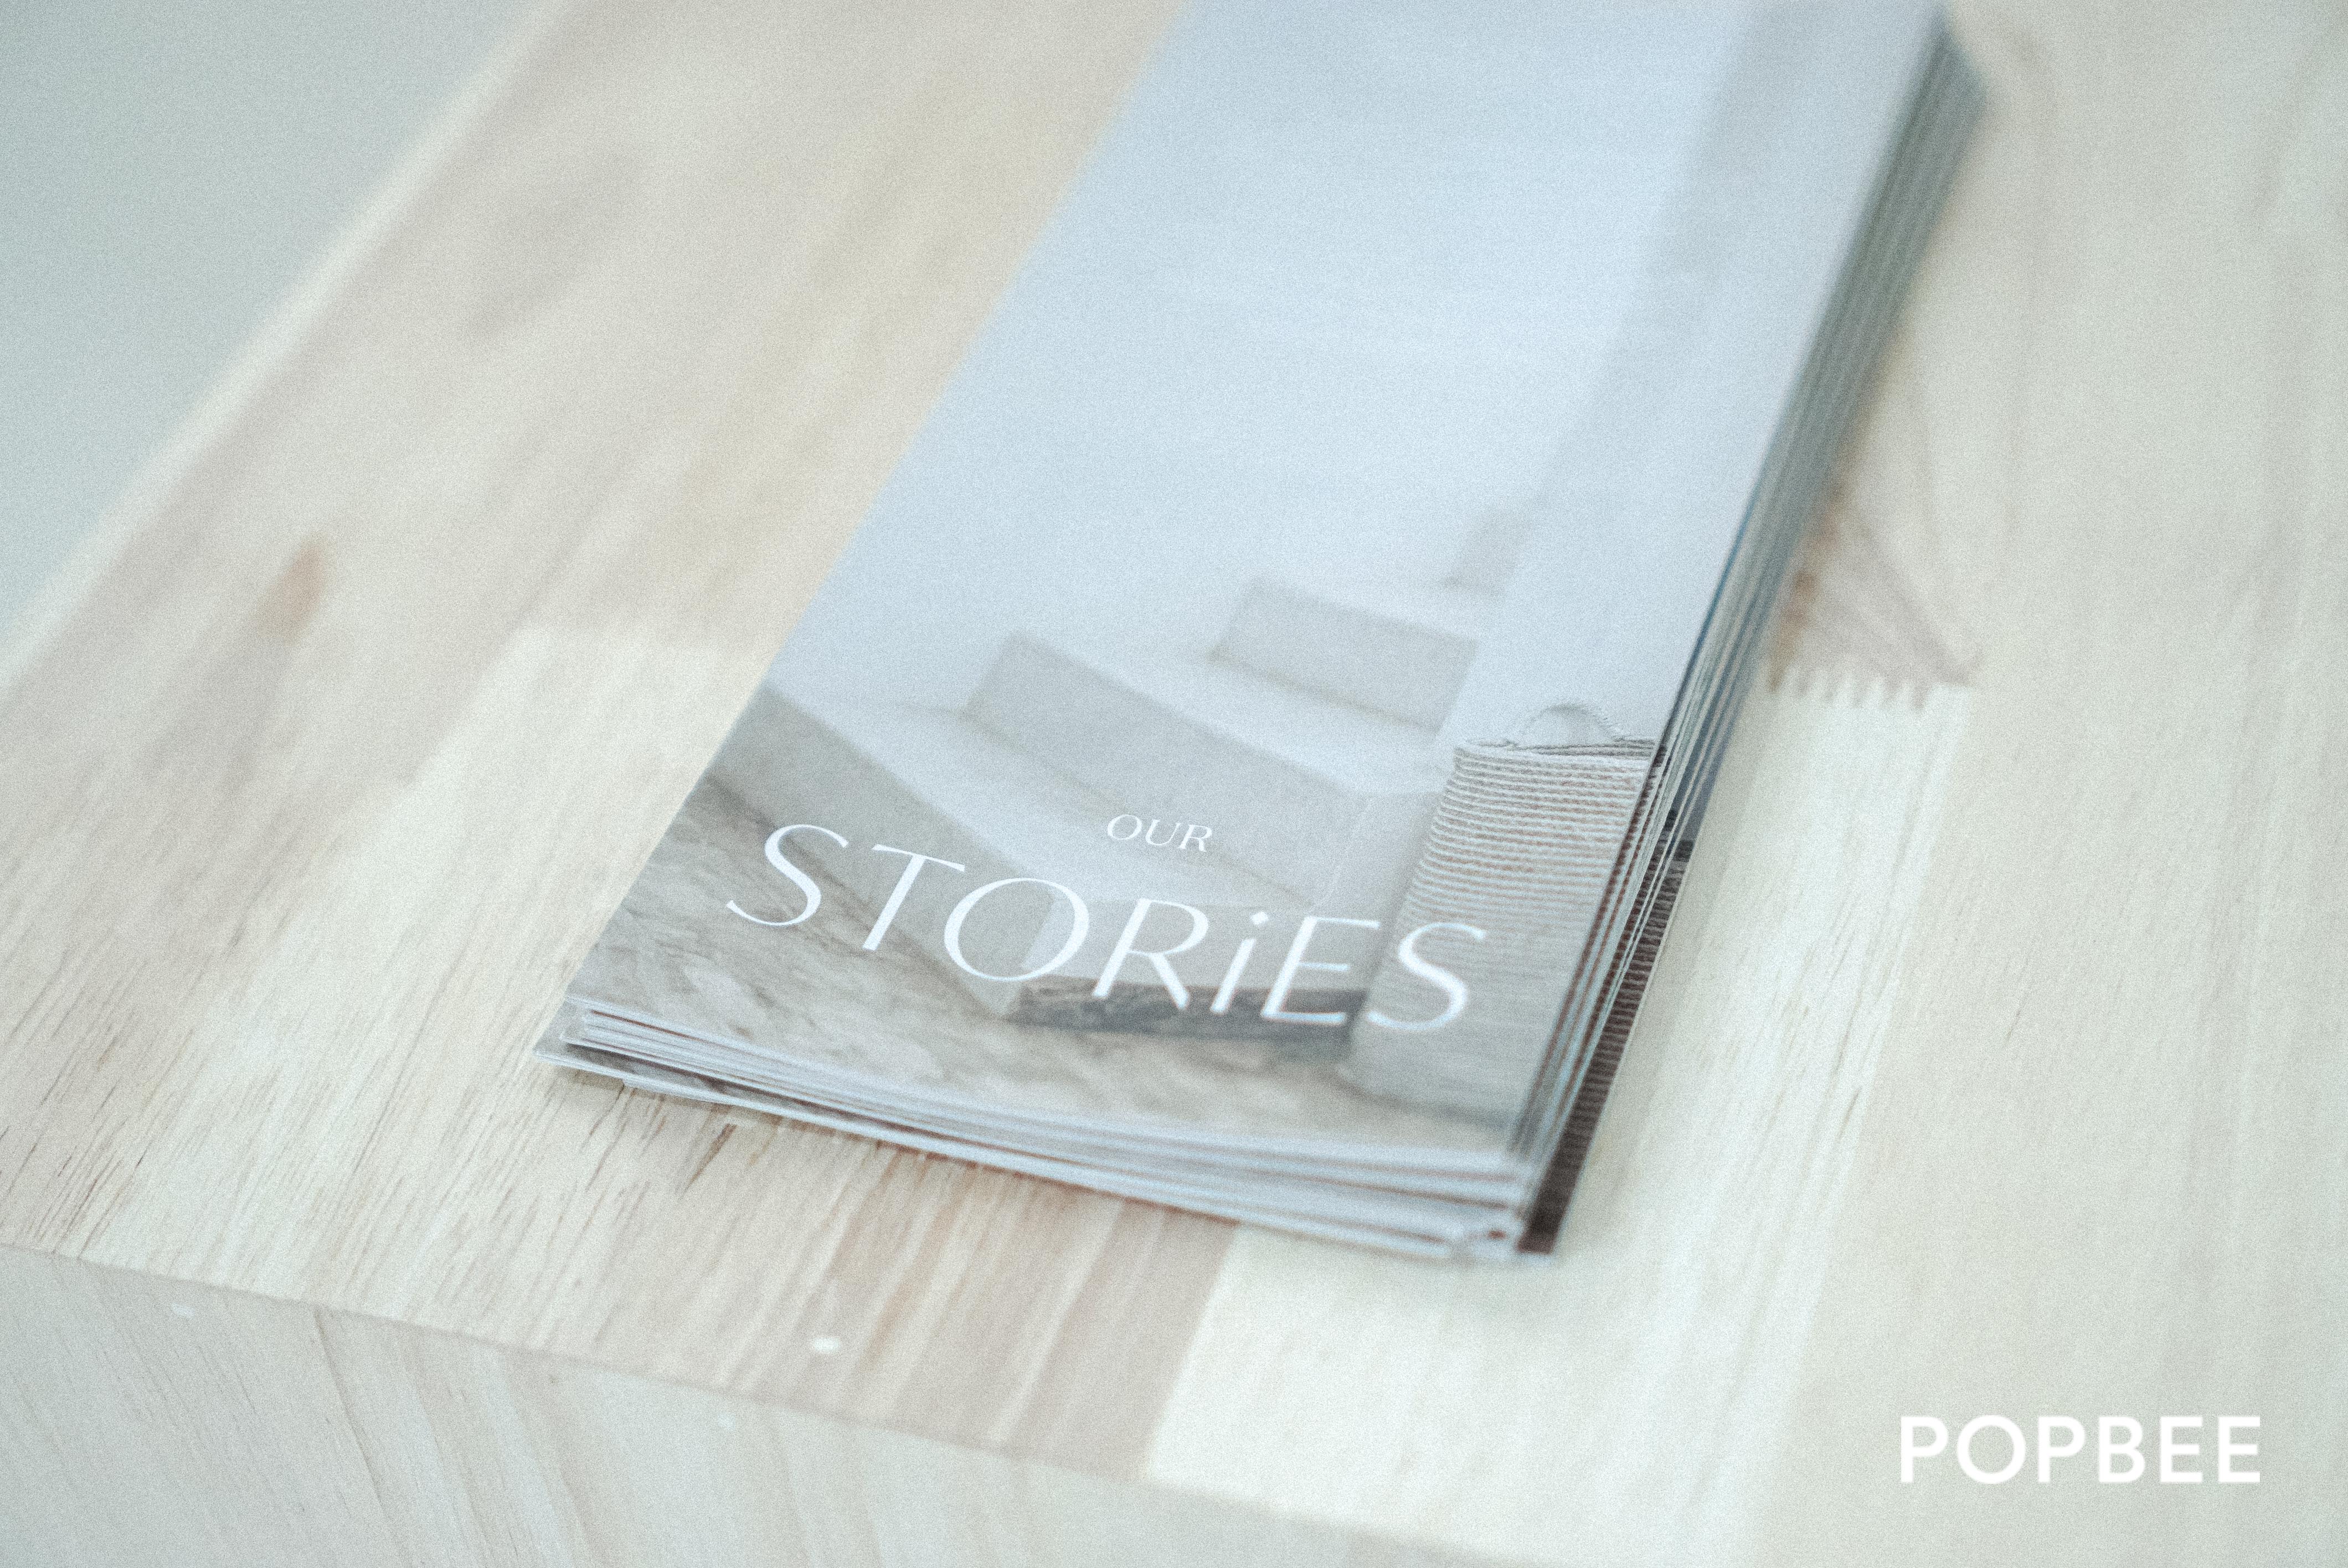 stories 24 hong kong local brand selected shop k11 musea